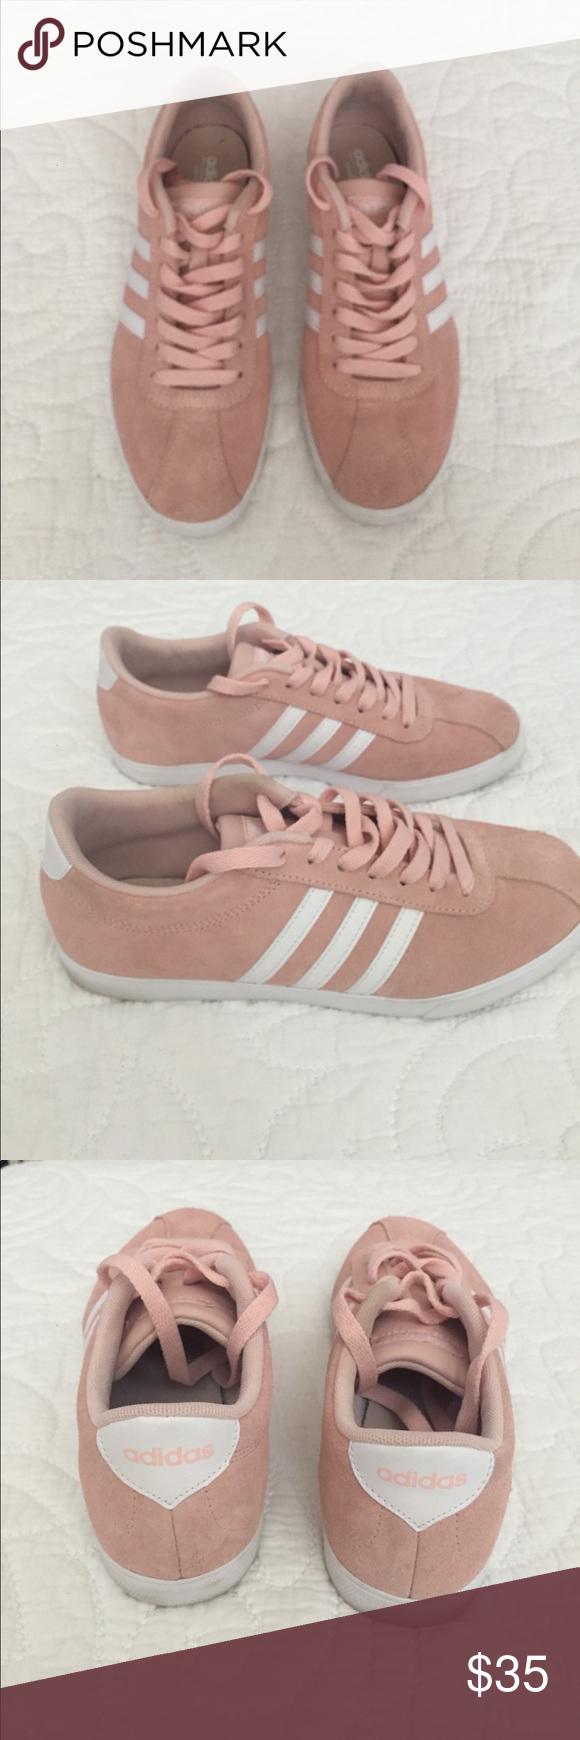 Adidas neo courtset scarpe rosa arrossire ti adidas tennis